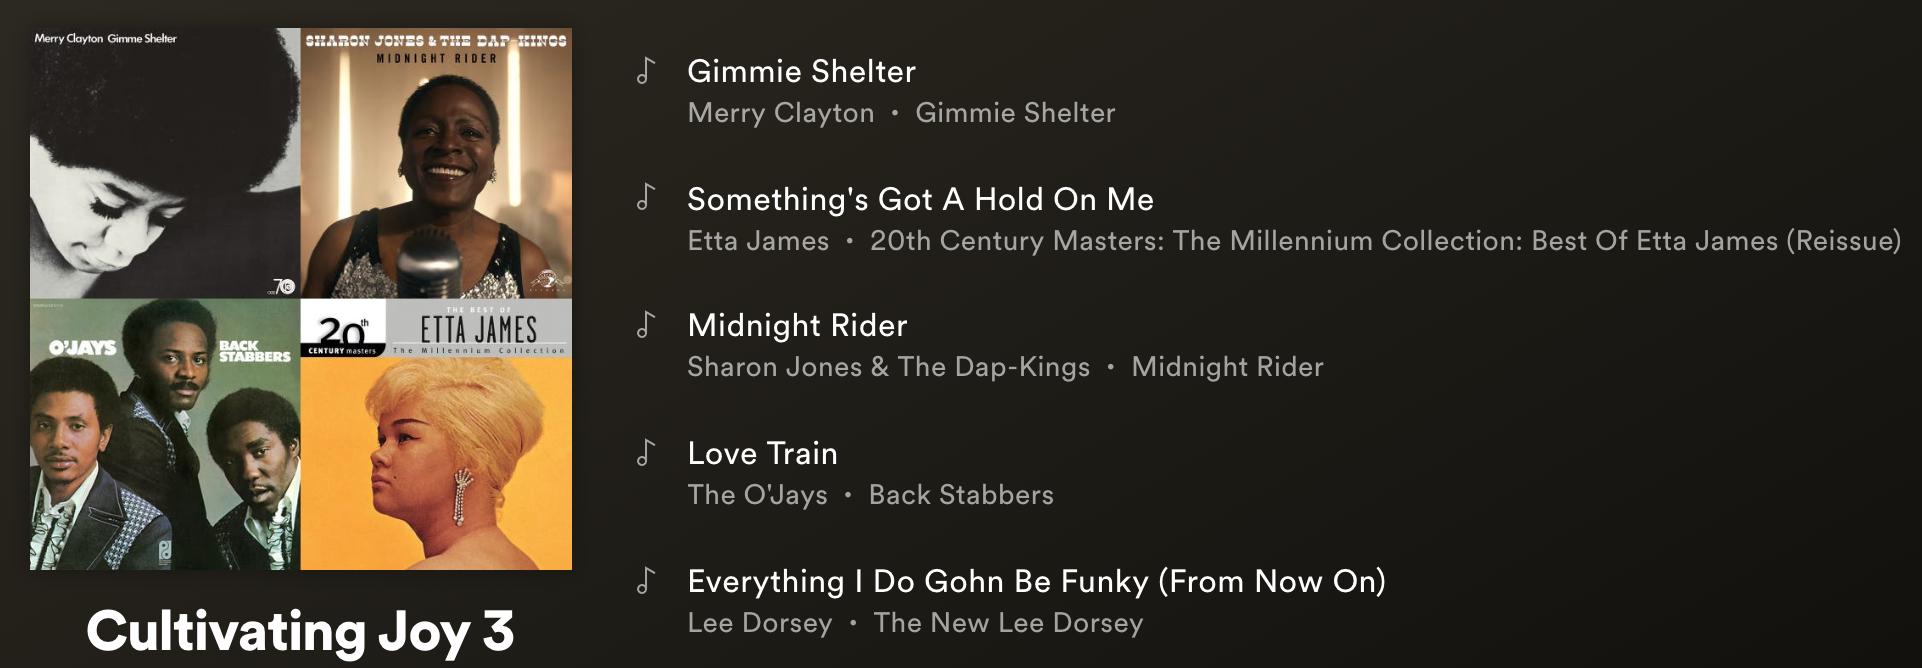 Cultivating Joy Playlist 3 - Click here for Spotify Playlist